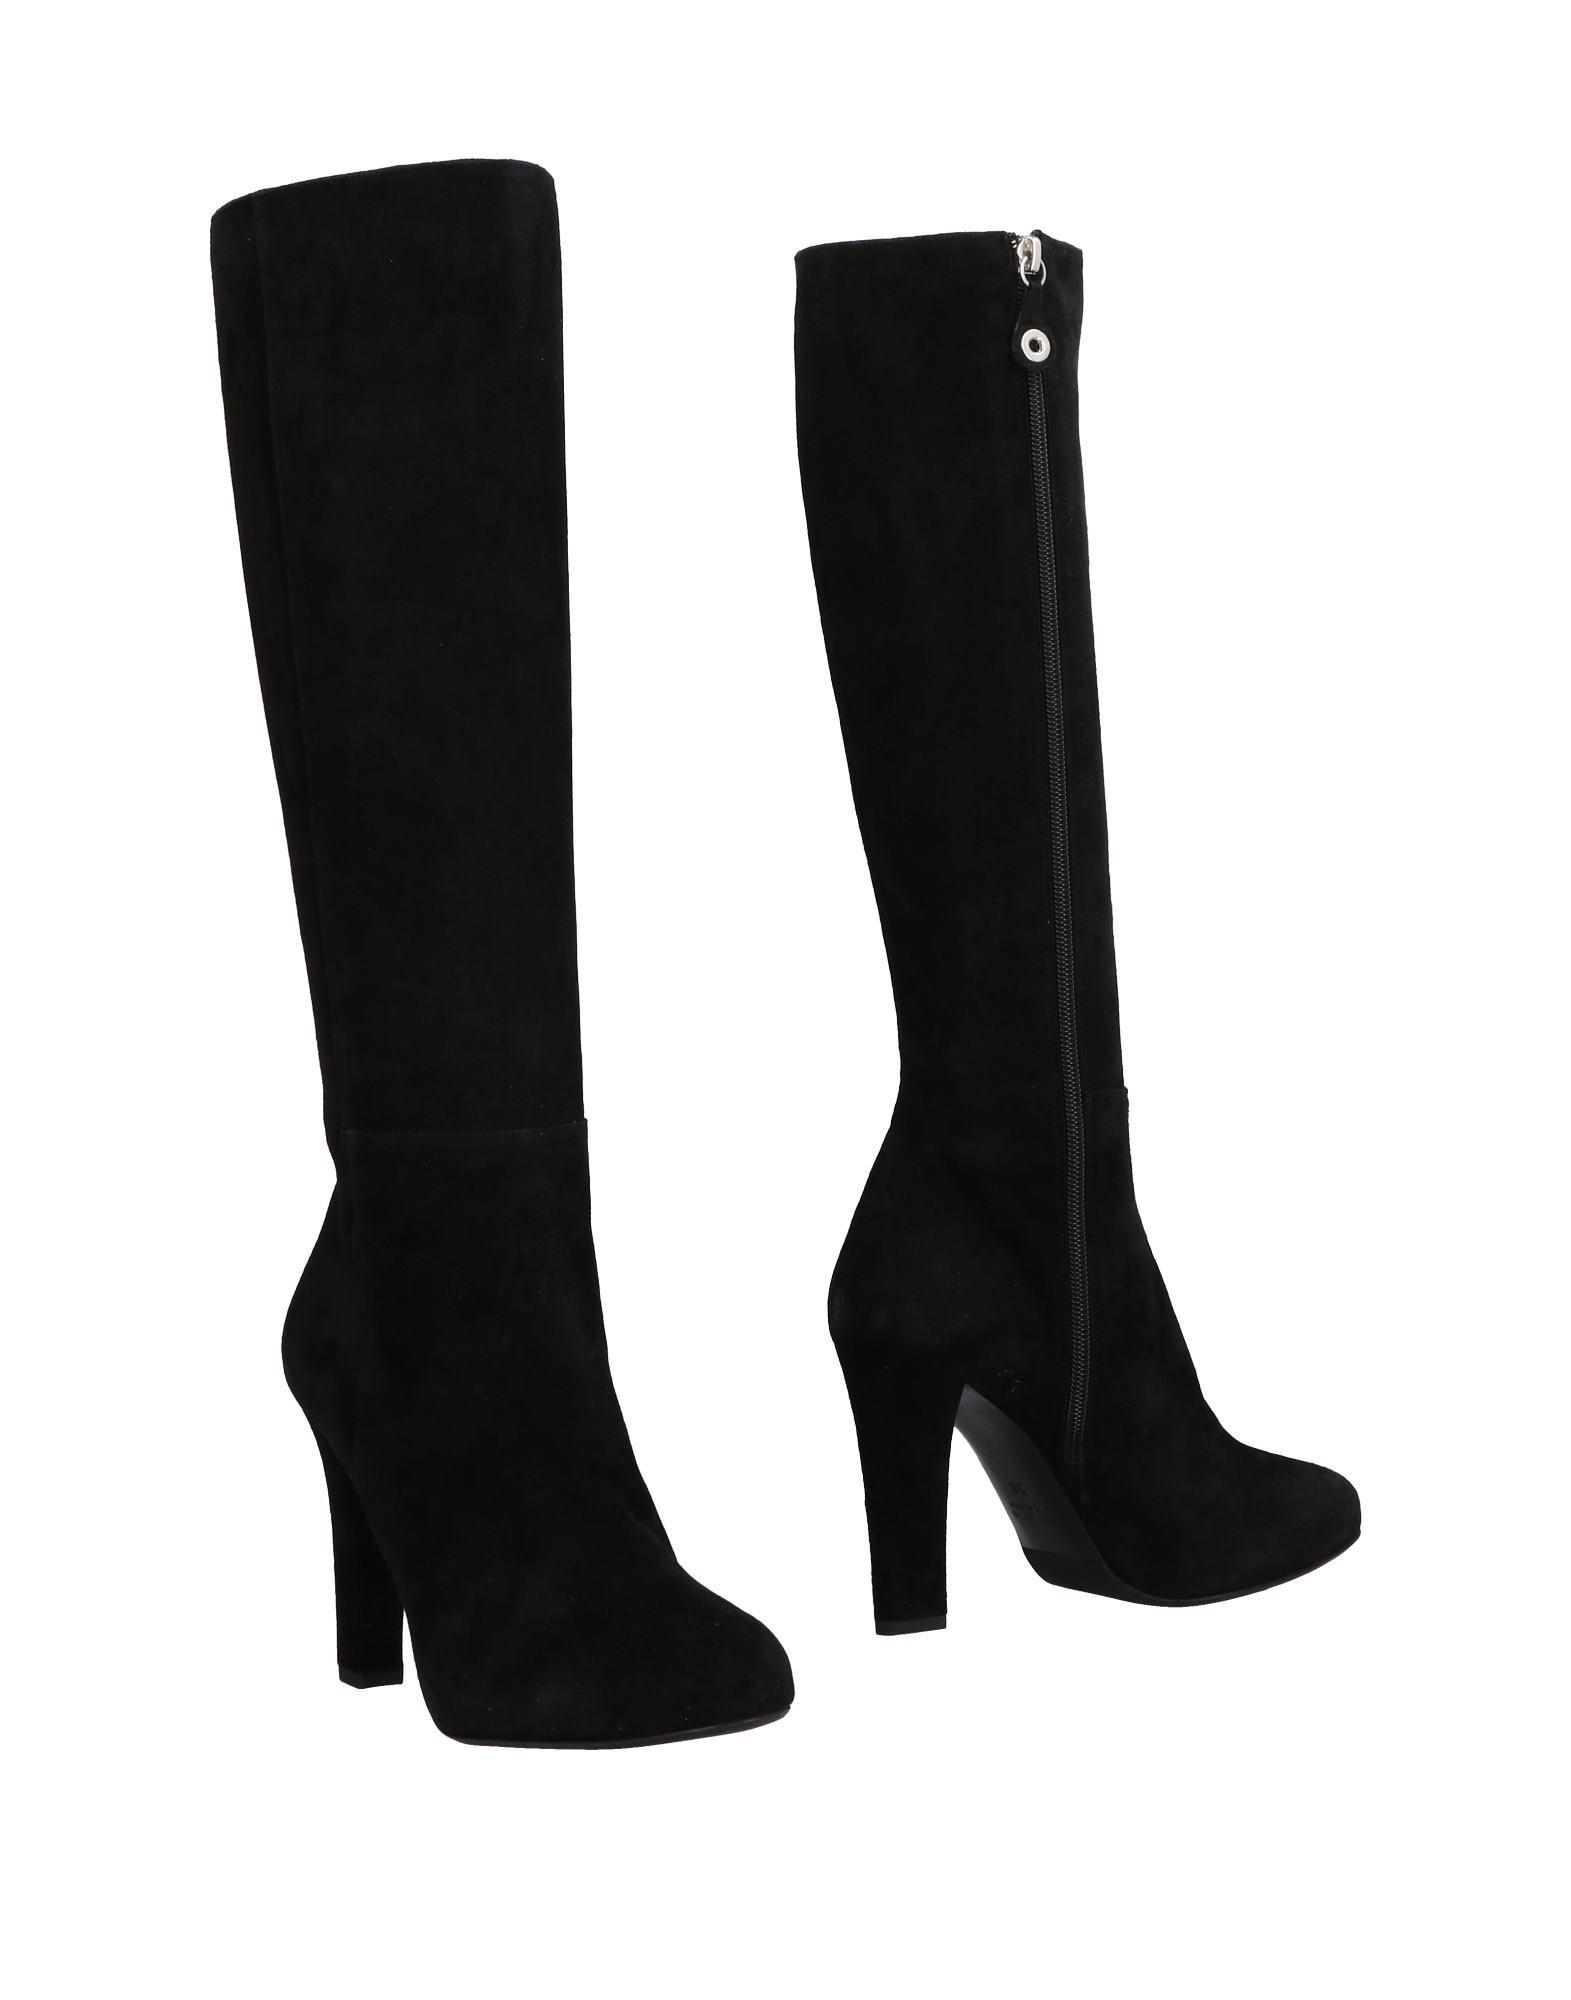 Lella Baldi Stiefel Damen  11501867RQGut aussehende strapazierfähige Schuhe